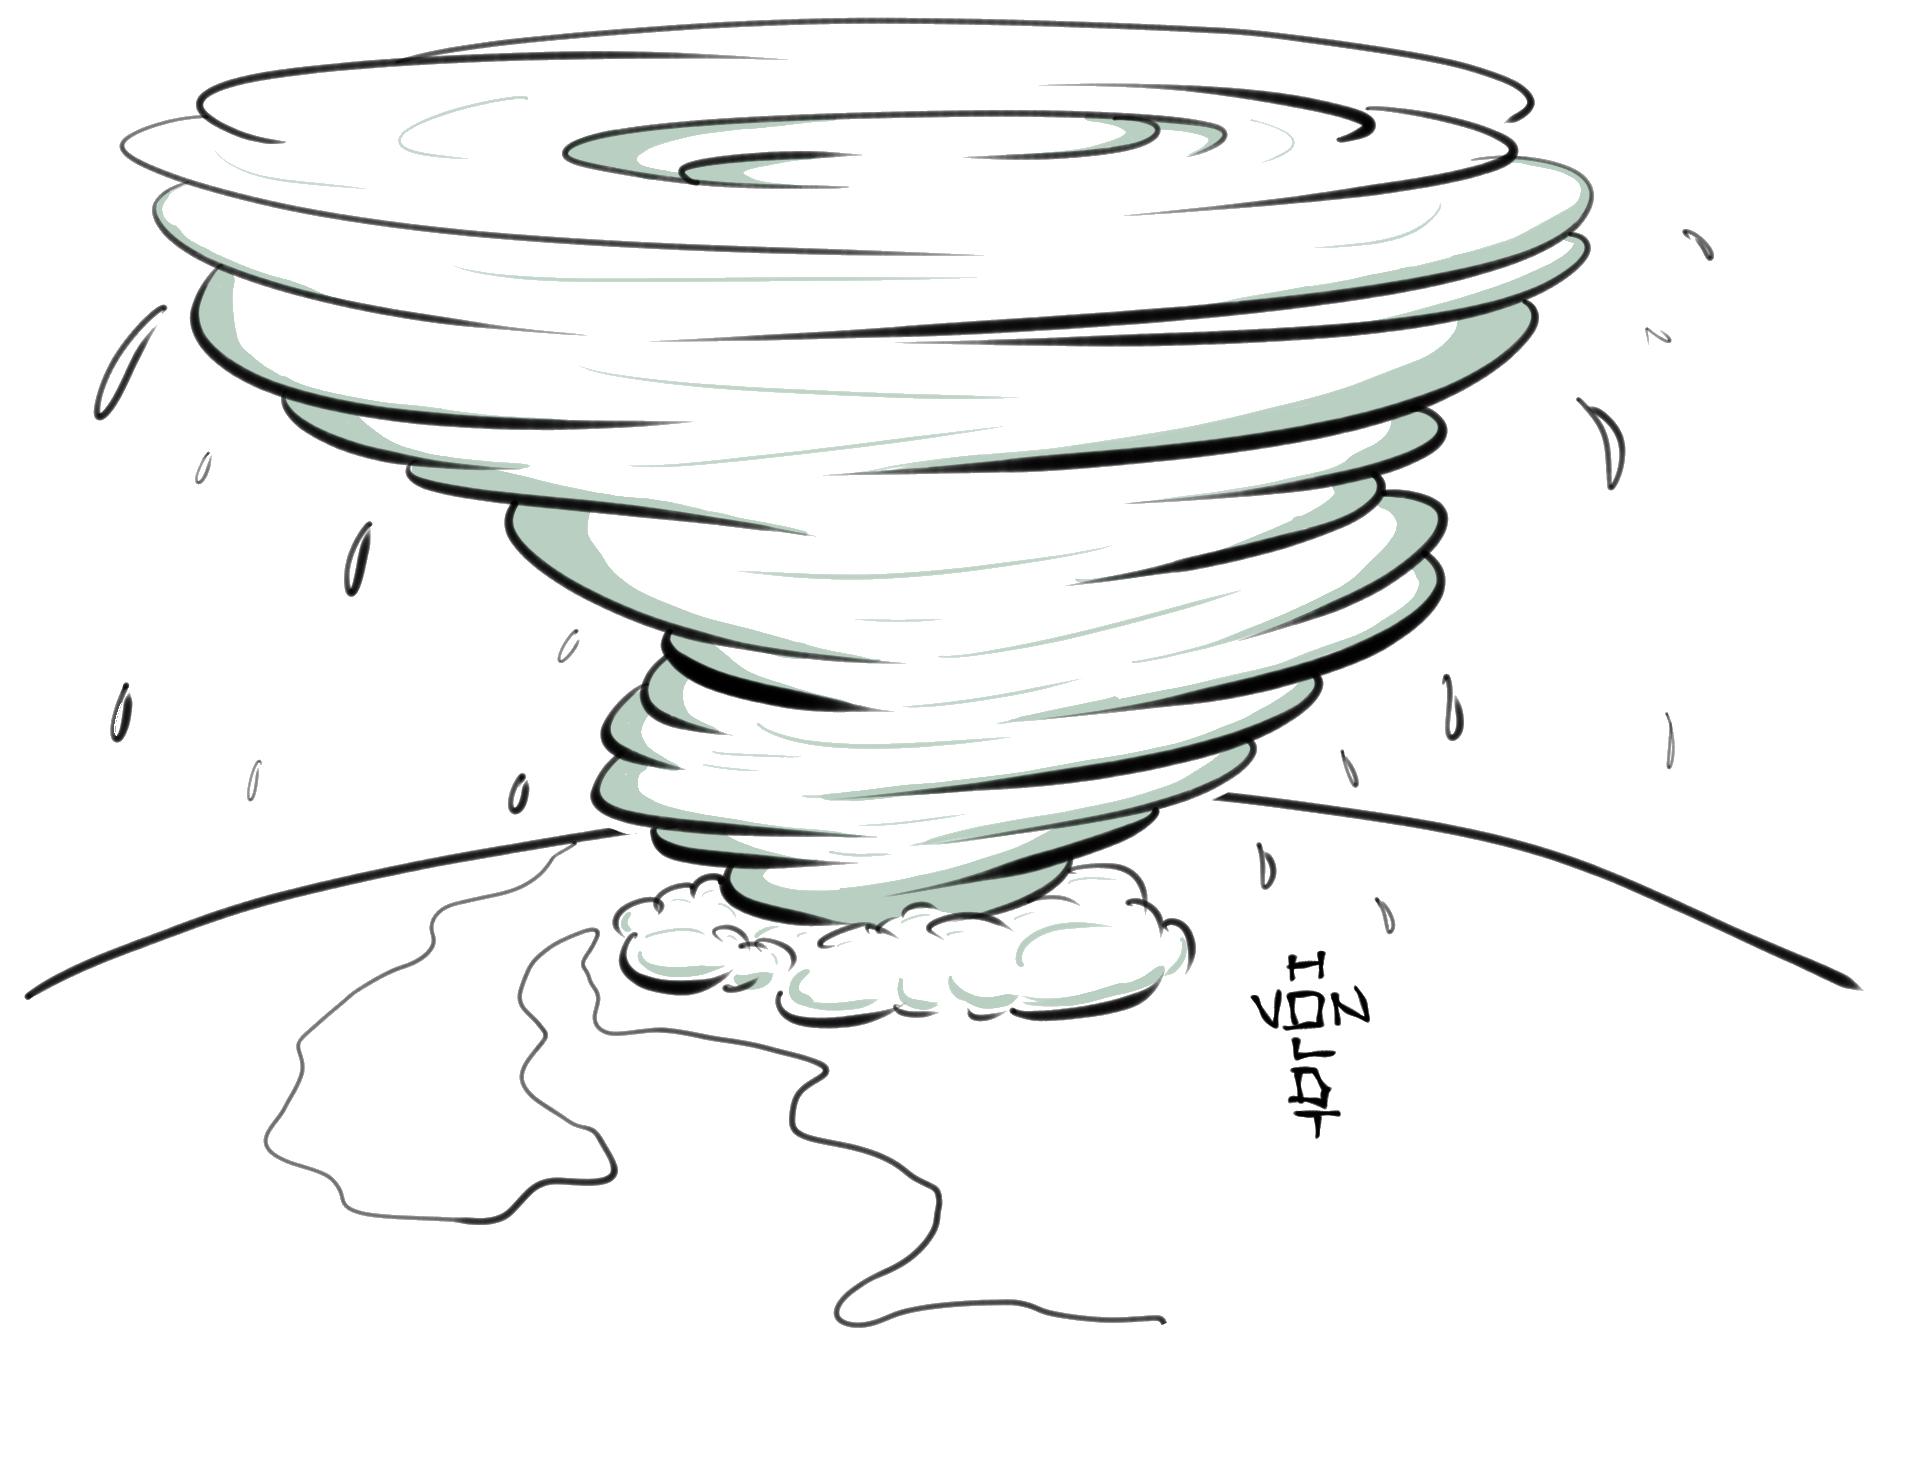 Hurricane clipart hurricane katrina. Drawing tropical cyclone tornado